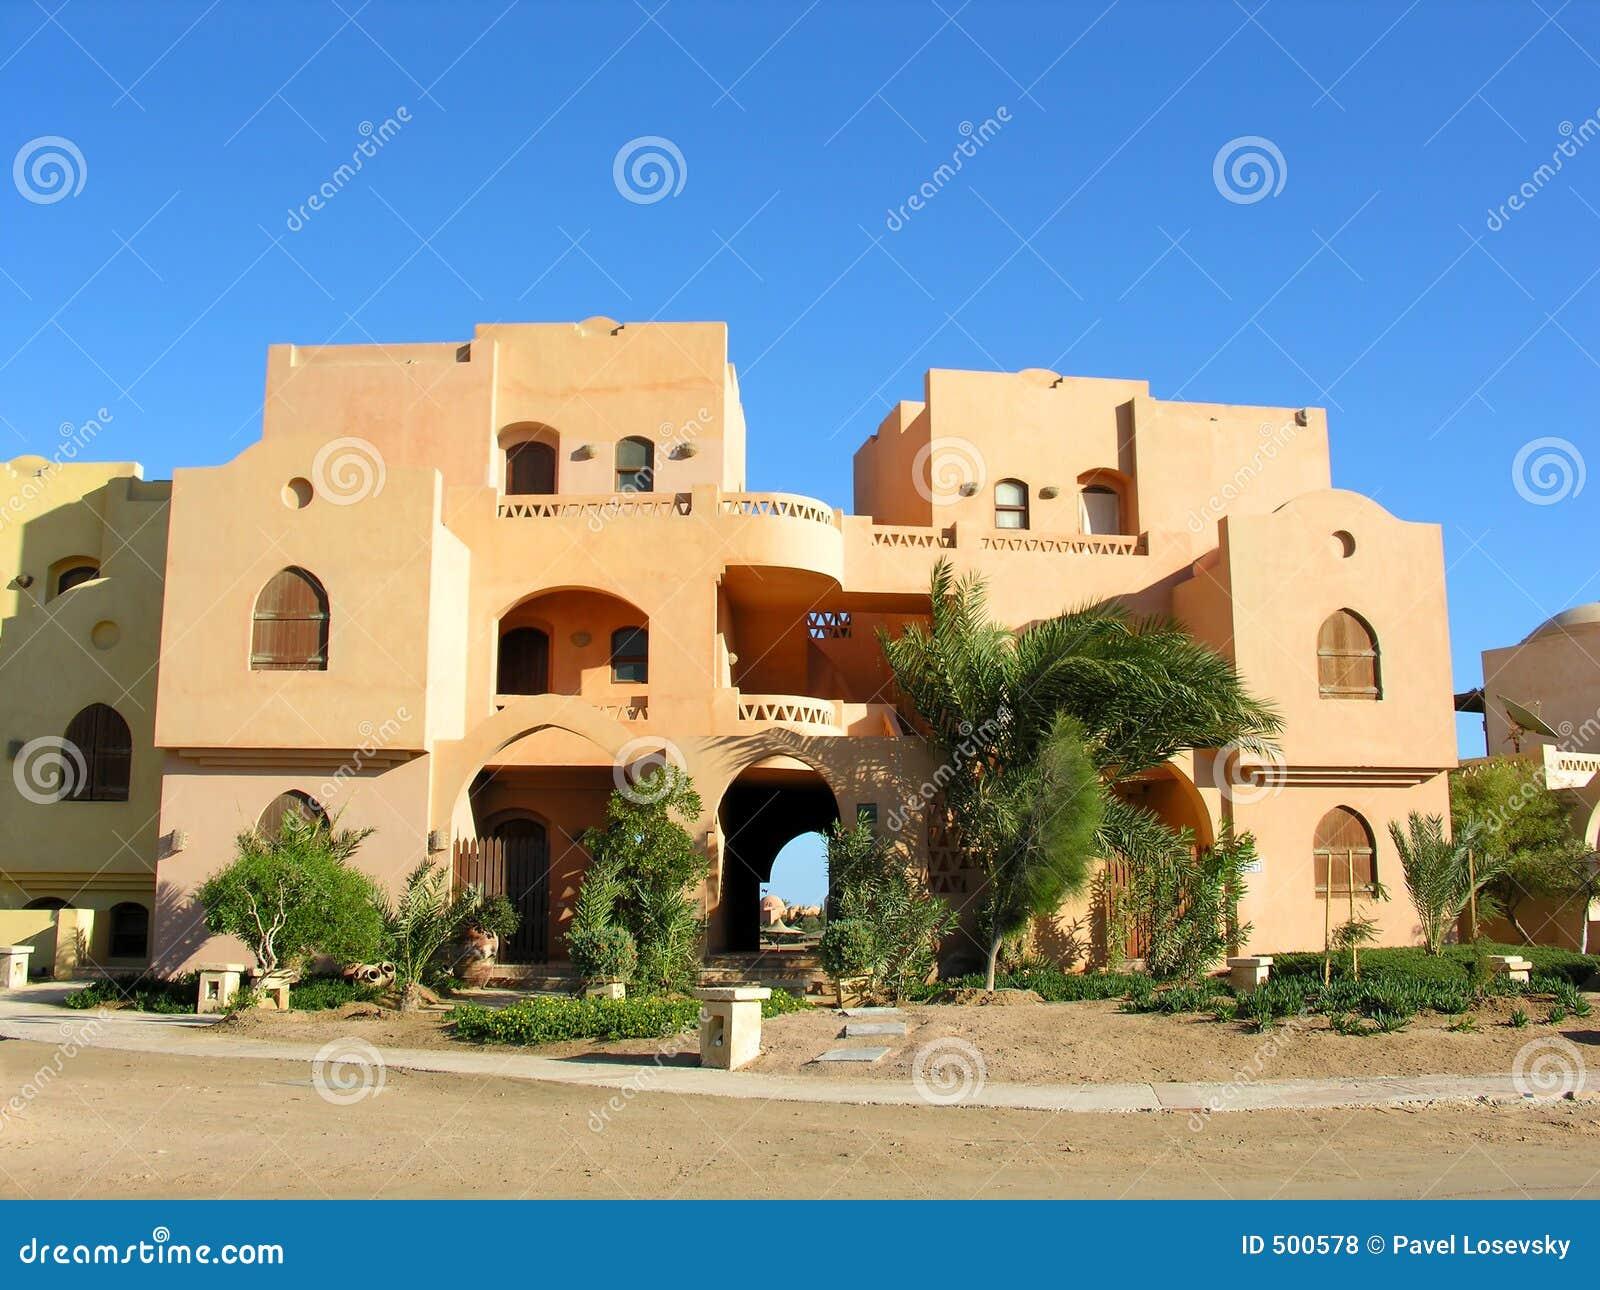 Arabian house royalty free stock photos image 500578 for Architecture maison arabe